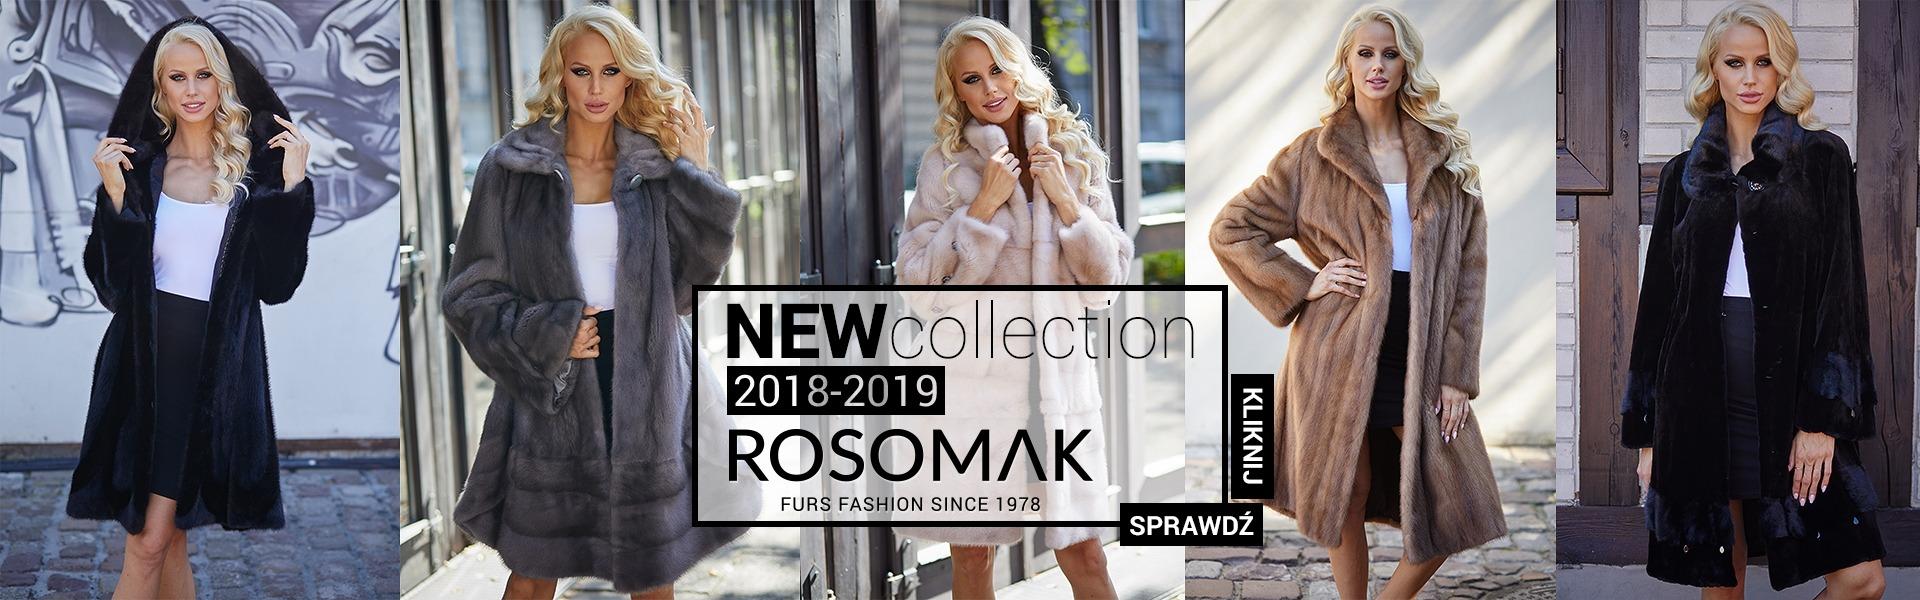 Futra24.pl slider_futra24-nowy_rosomak2-2